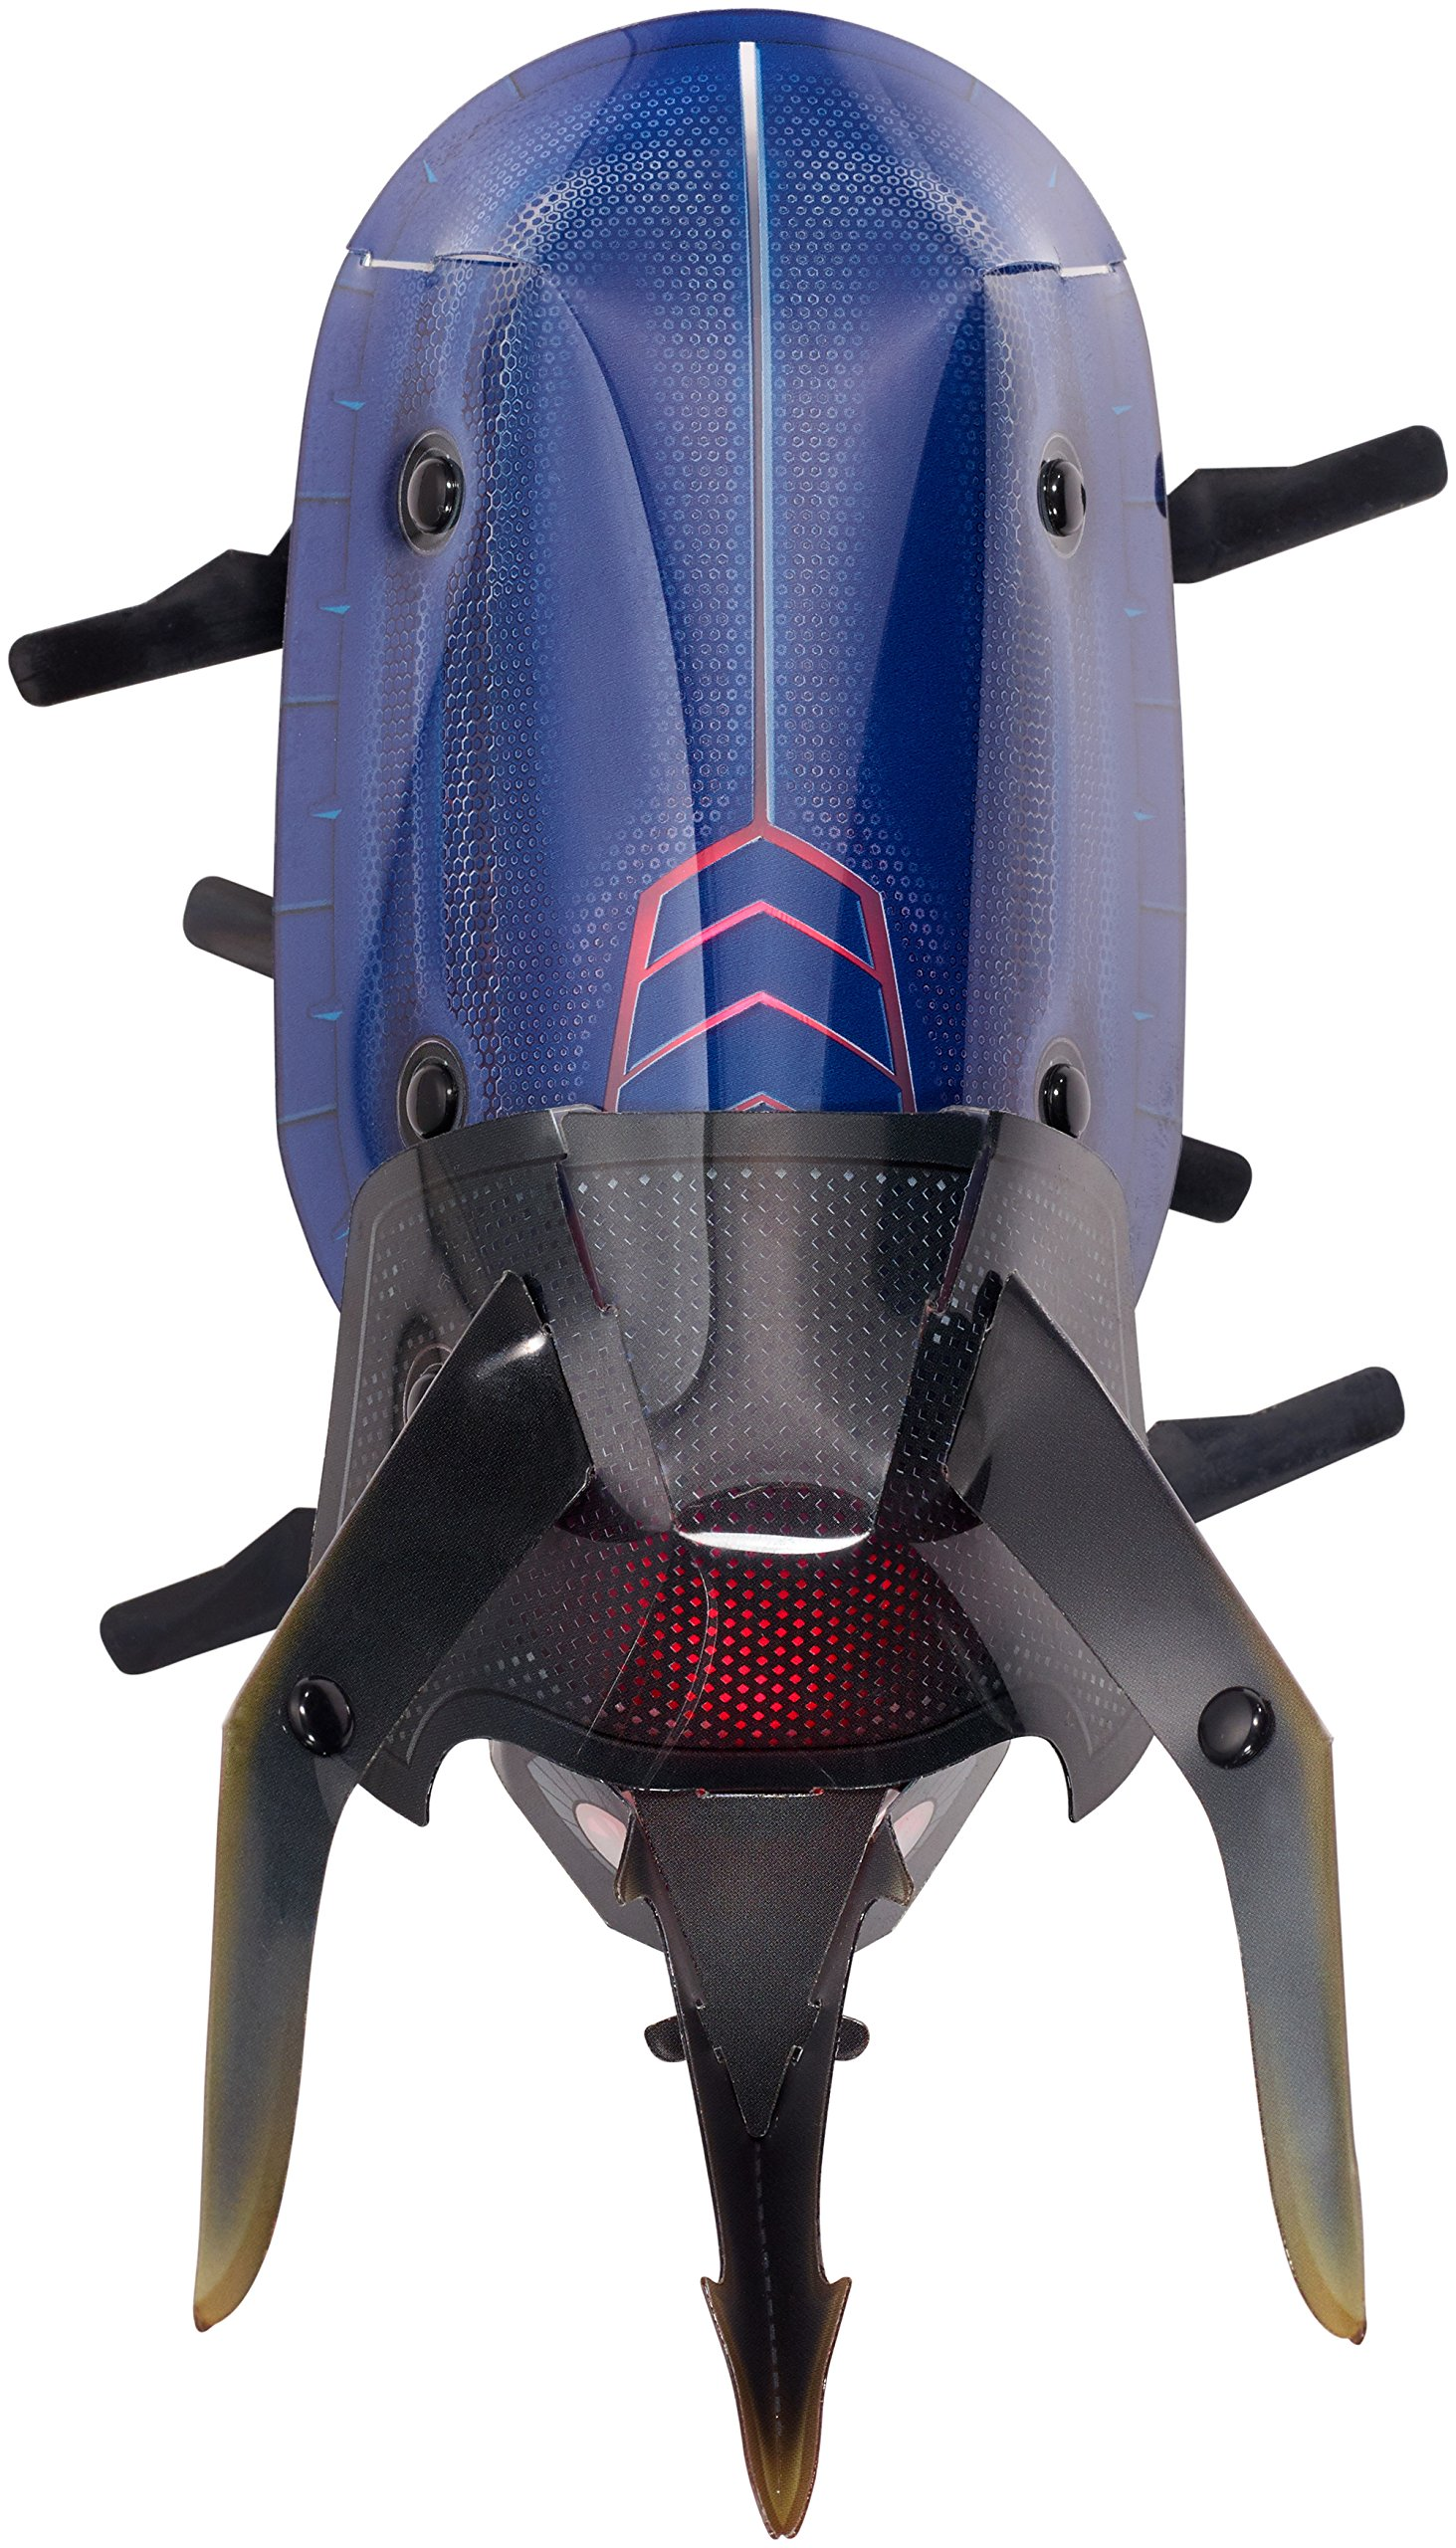 Kamigami Atlasar Robot by Mattel (Image #2)